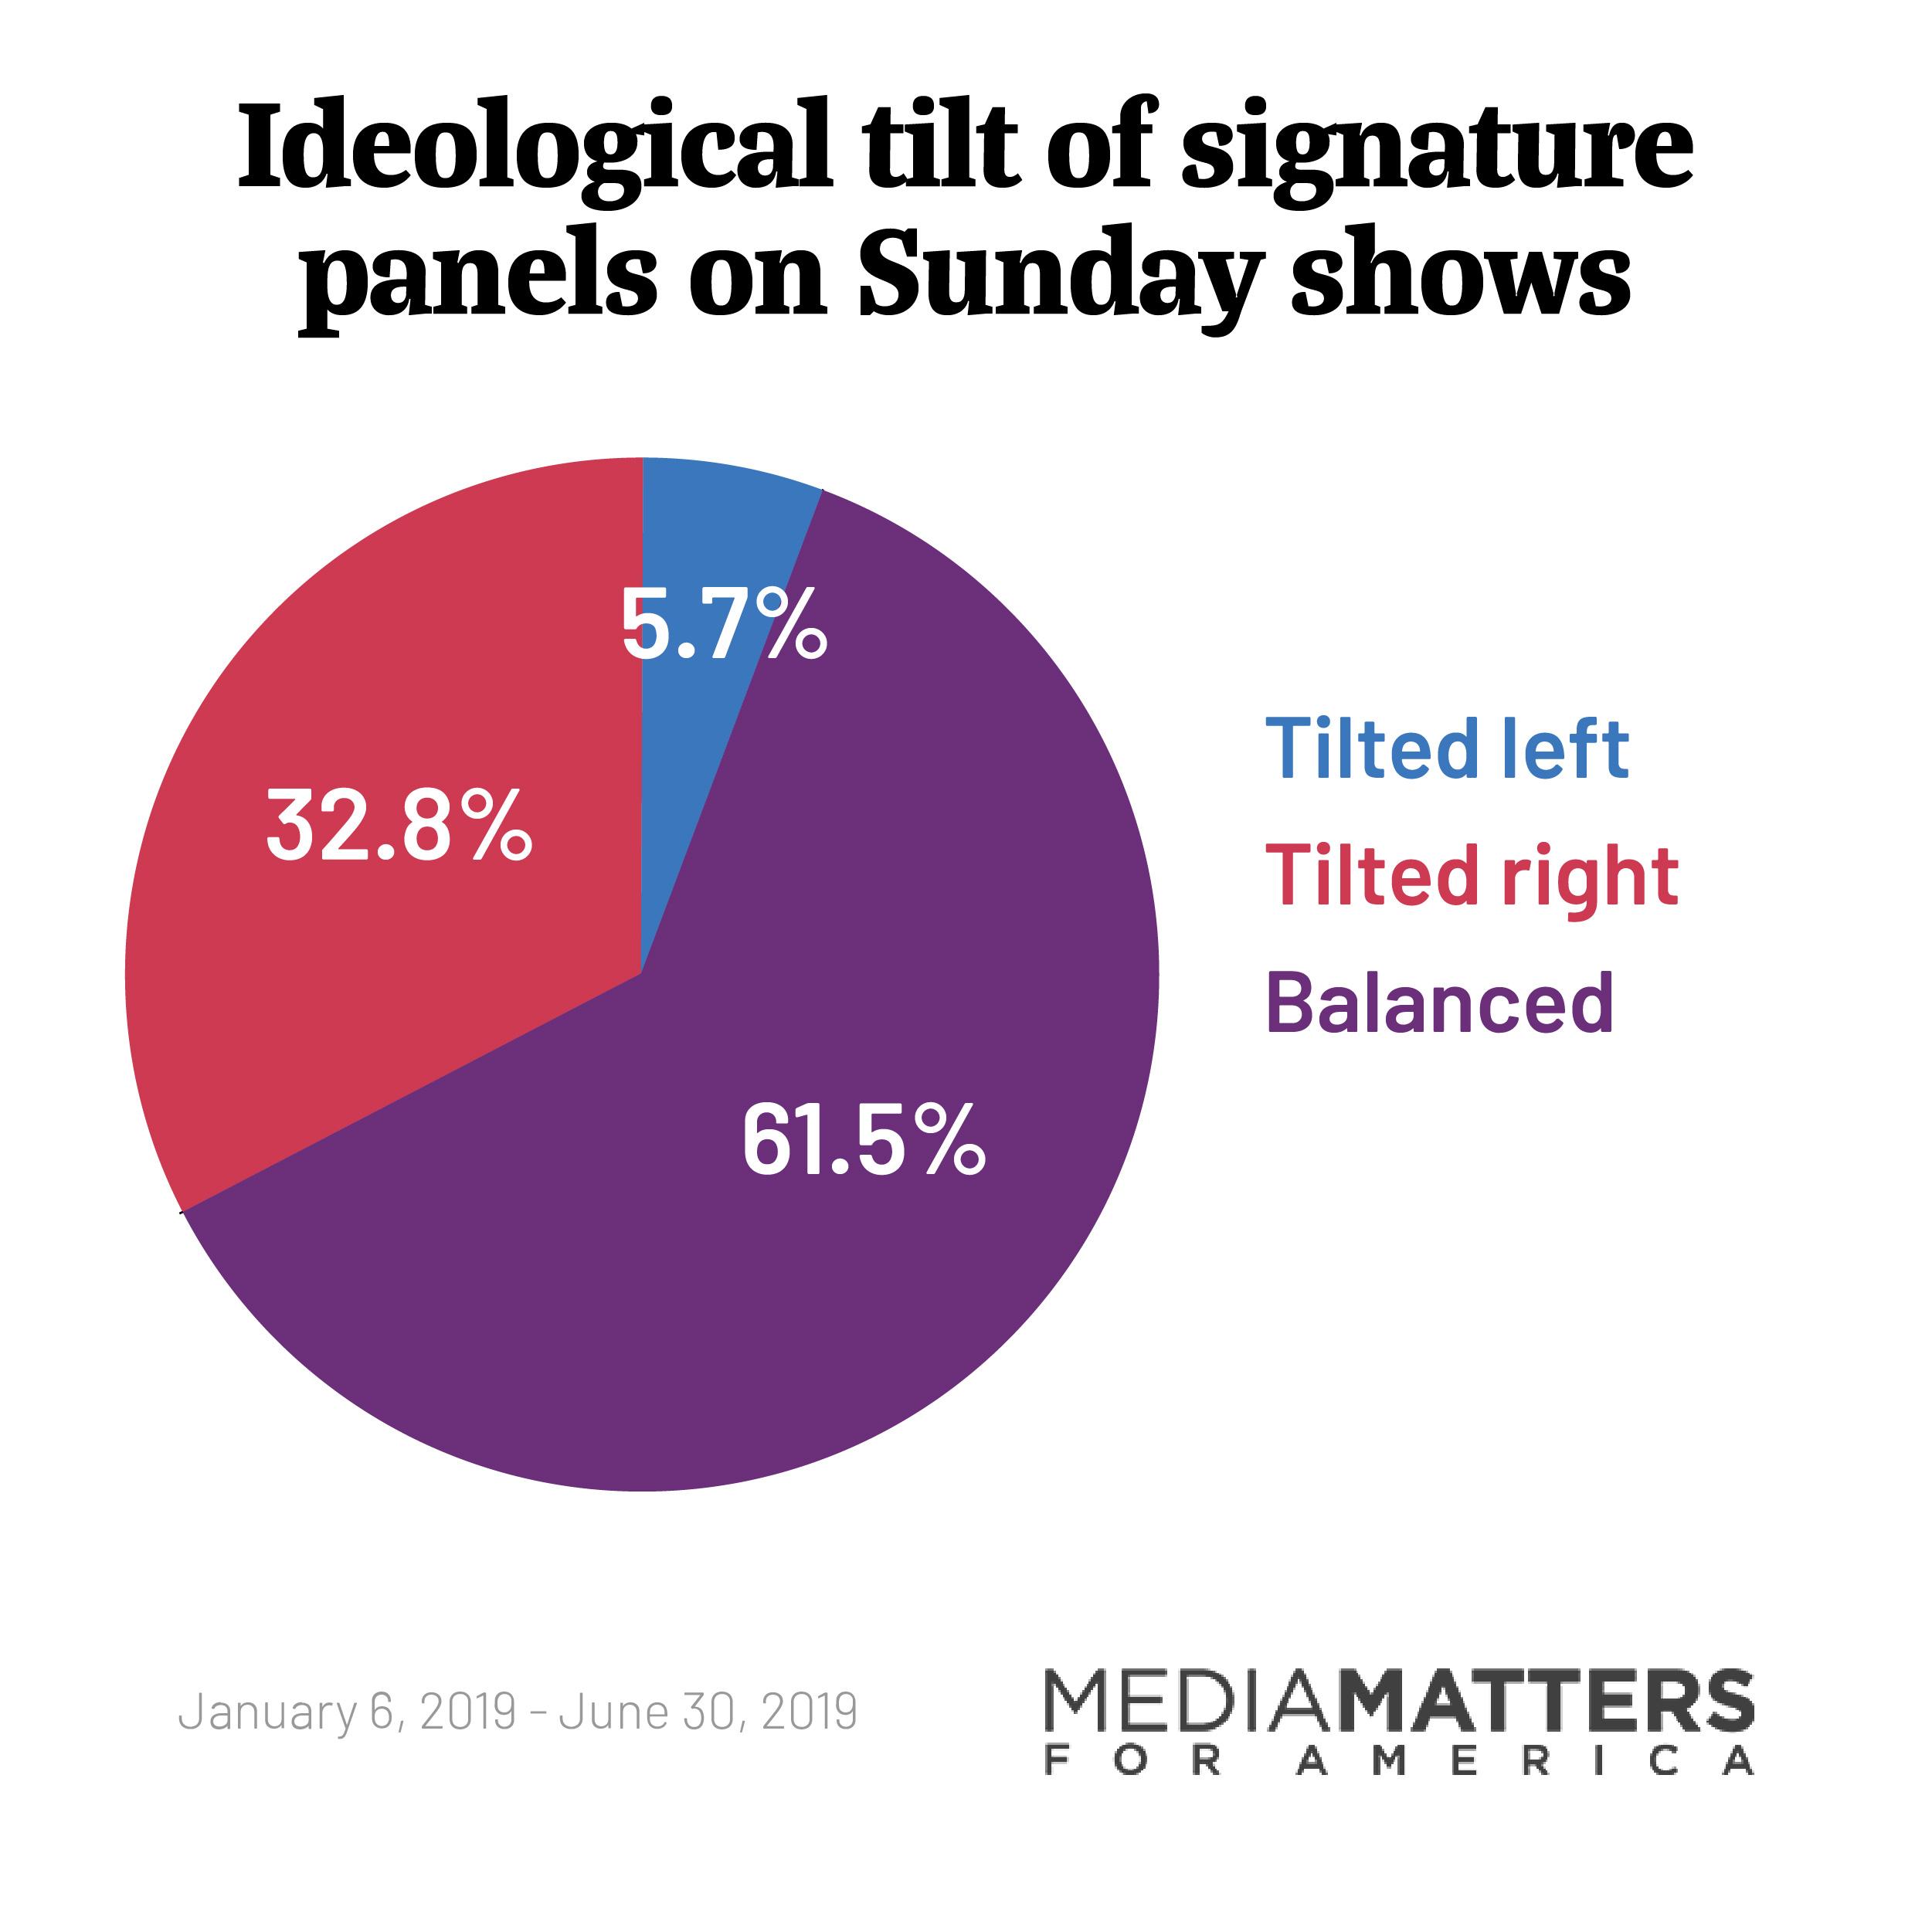 Ideological tilt of signature panels on Sunday shows